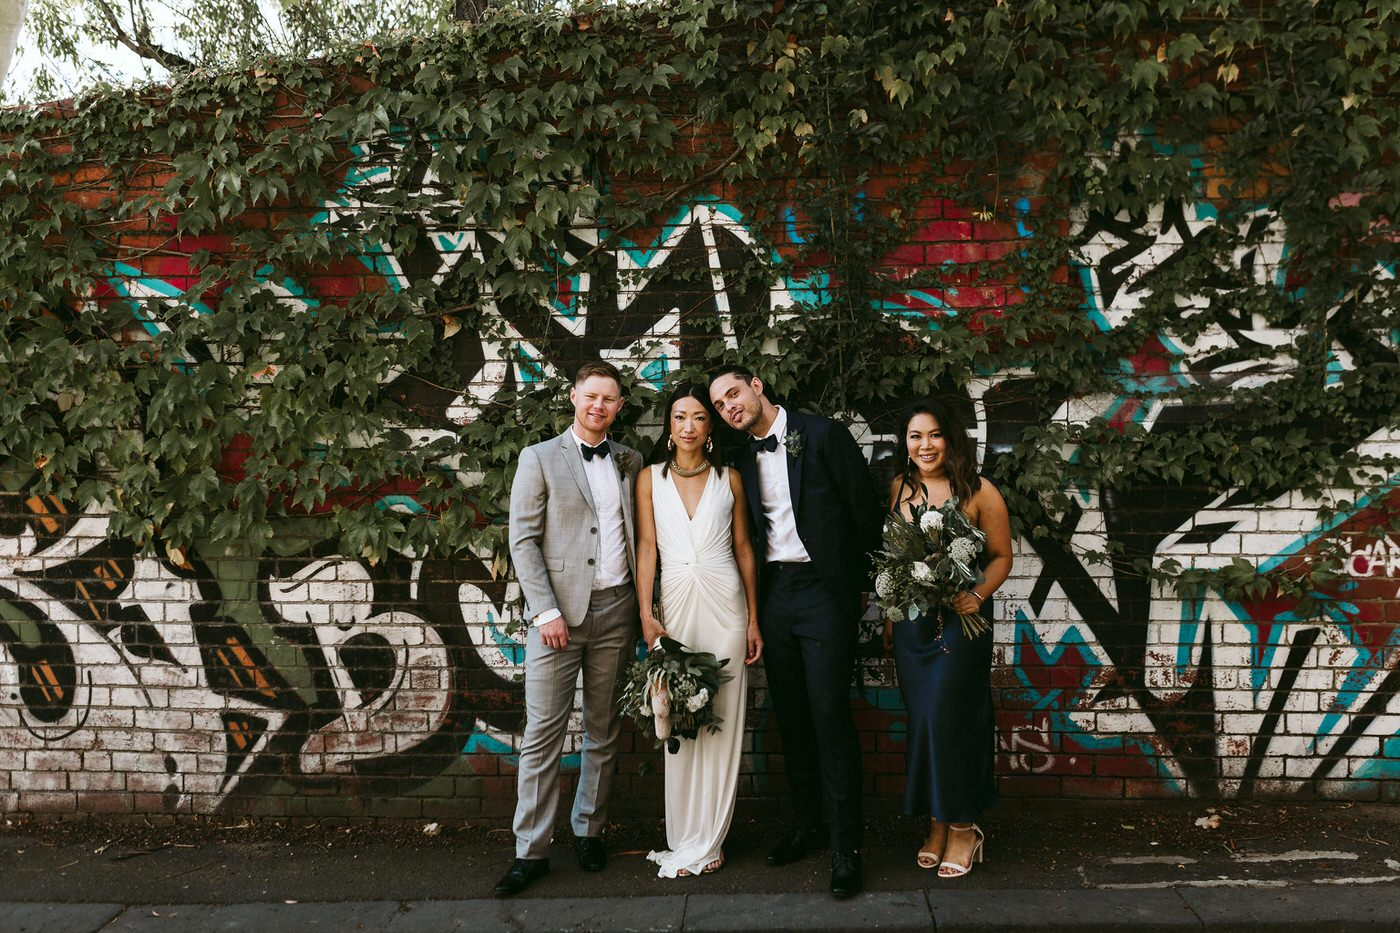 GoldandGrit_KimMatt_Panama-Dining-Room-Fitzroy-Collingwood-Relaxed-Fun-Candid-Wedding-Photography_44.jpg